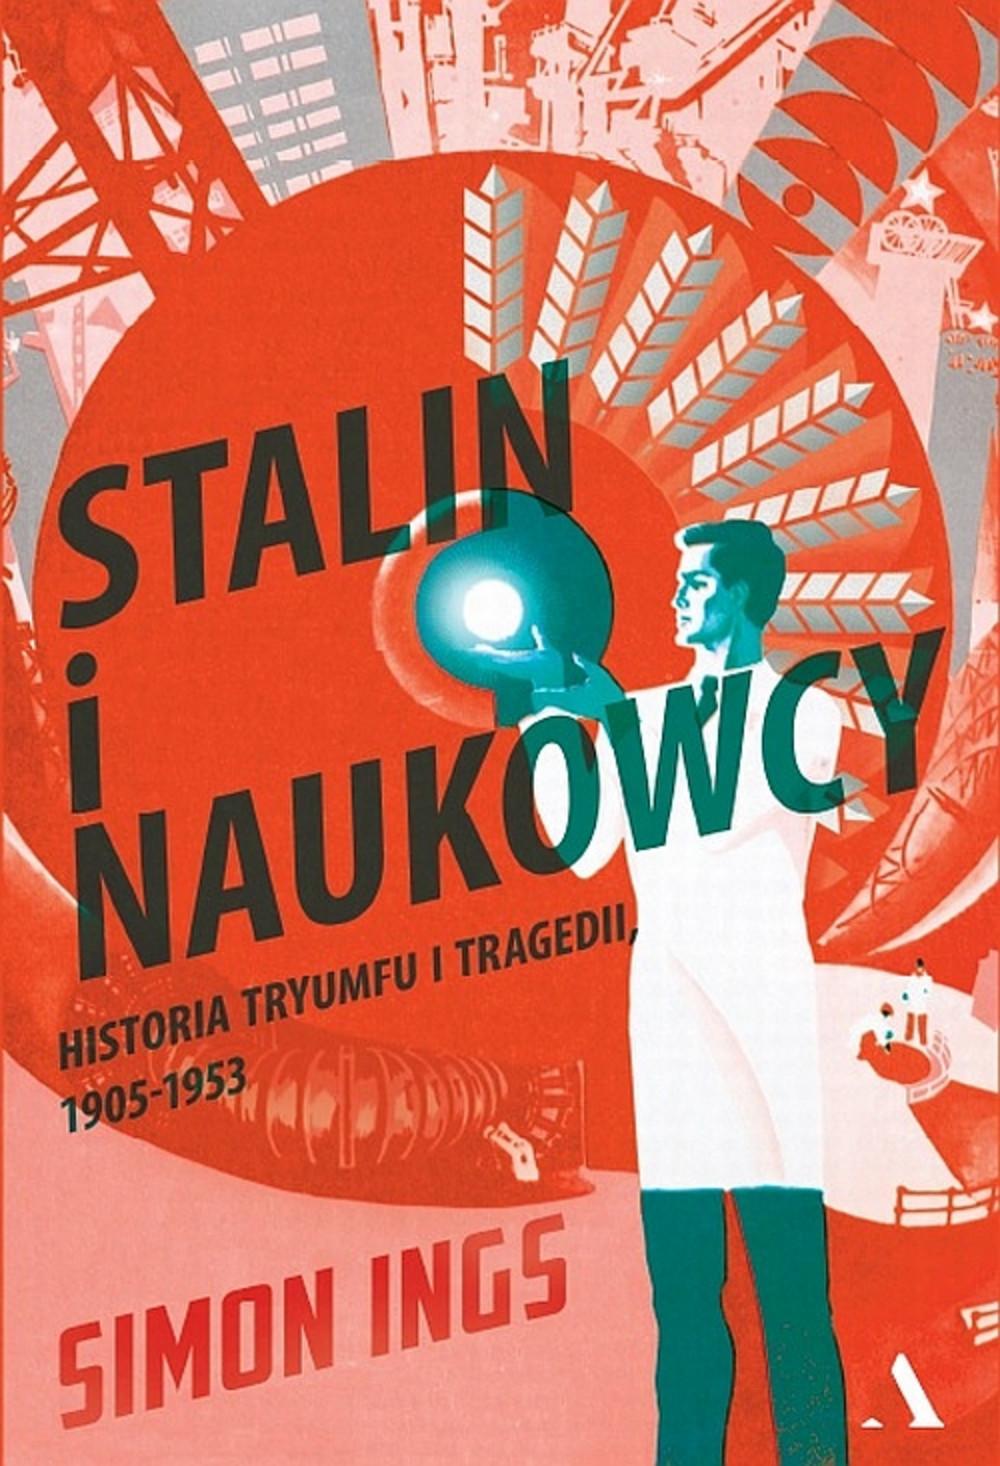 STALIN I NAUKOWCY HISTORIA TRYUMFU I TRAGEDII 1905 1953 SIMON INGS